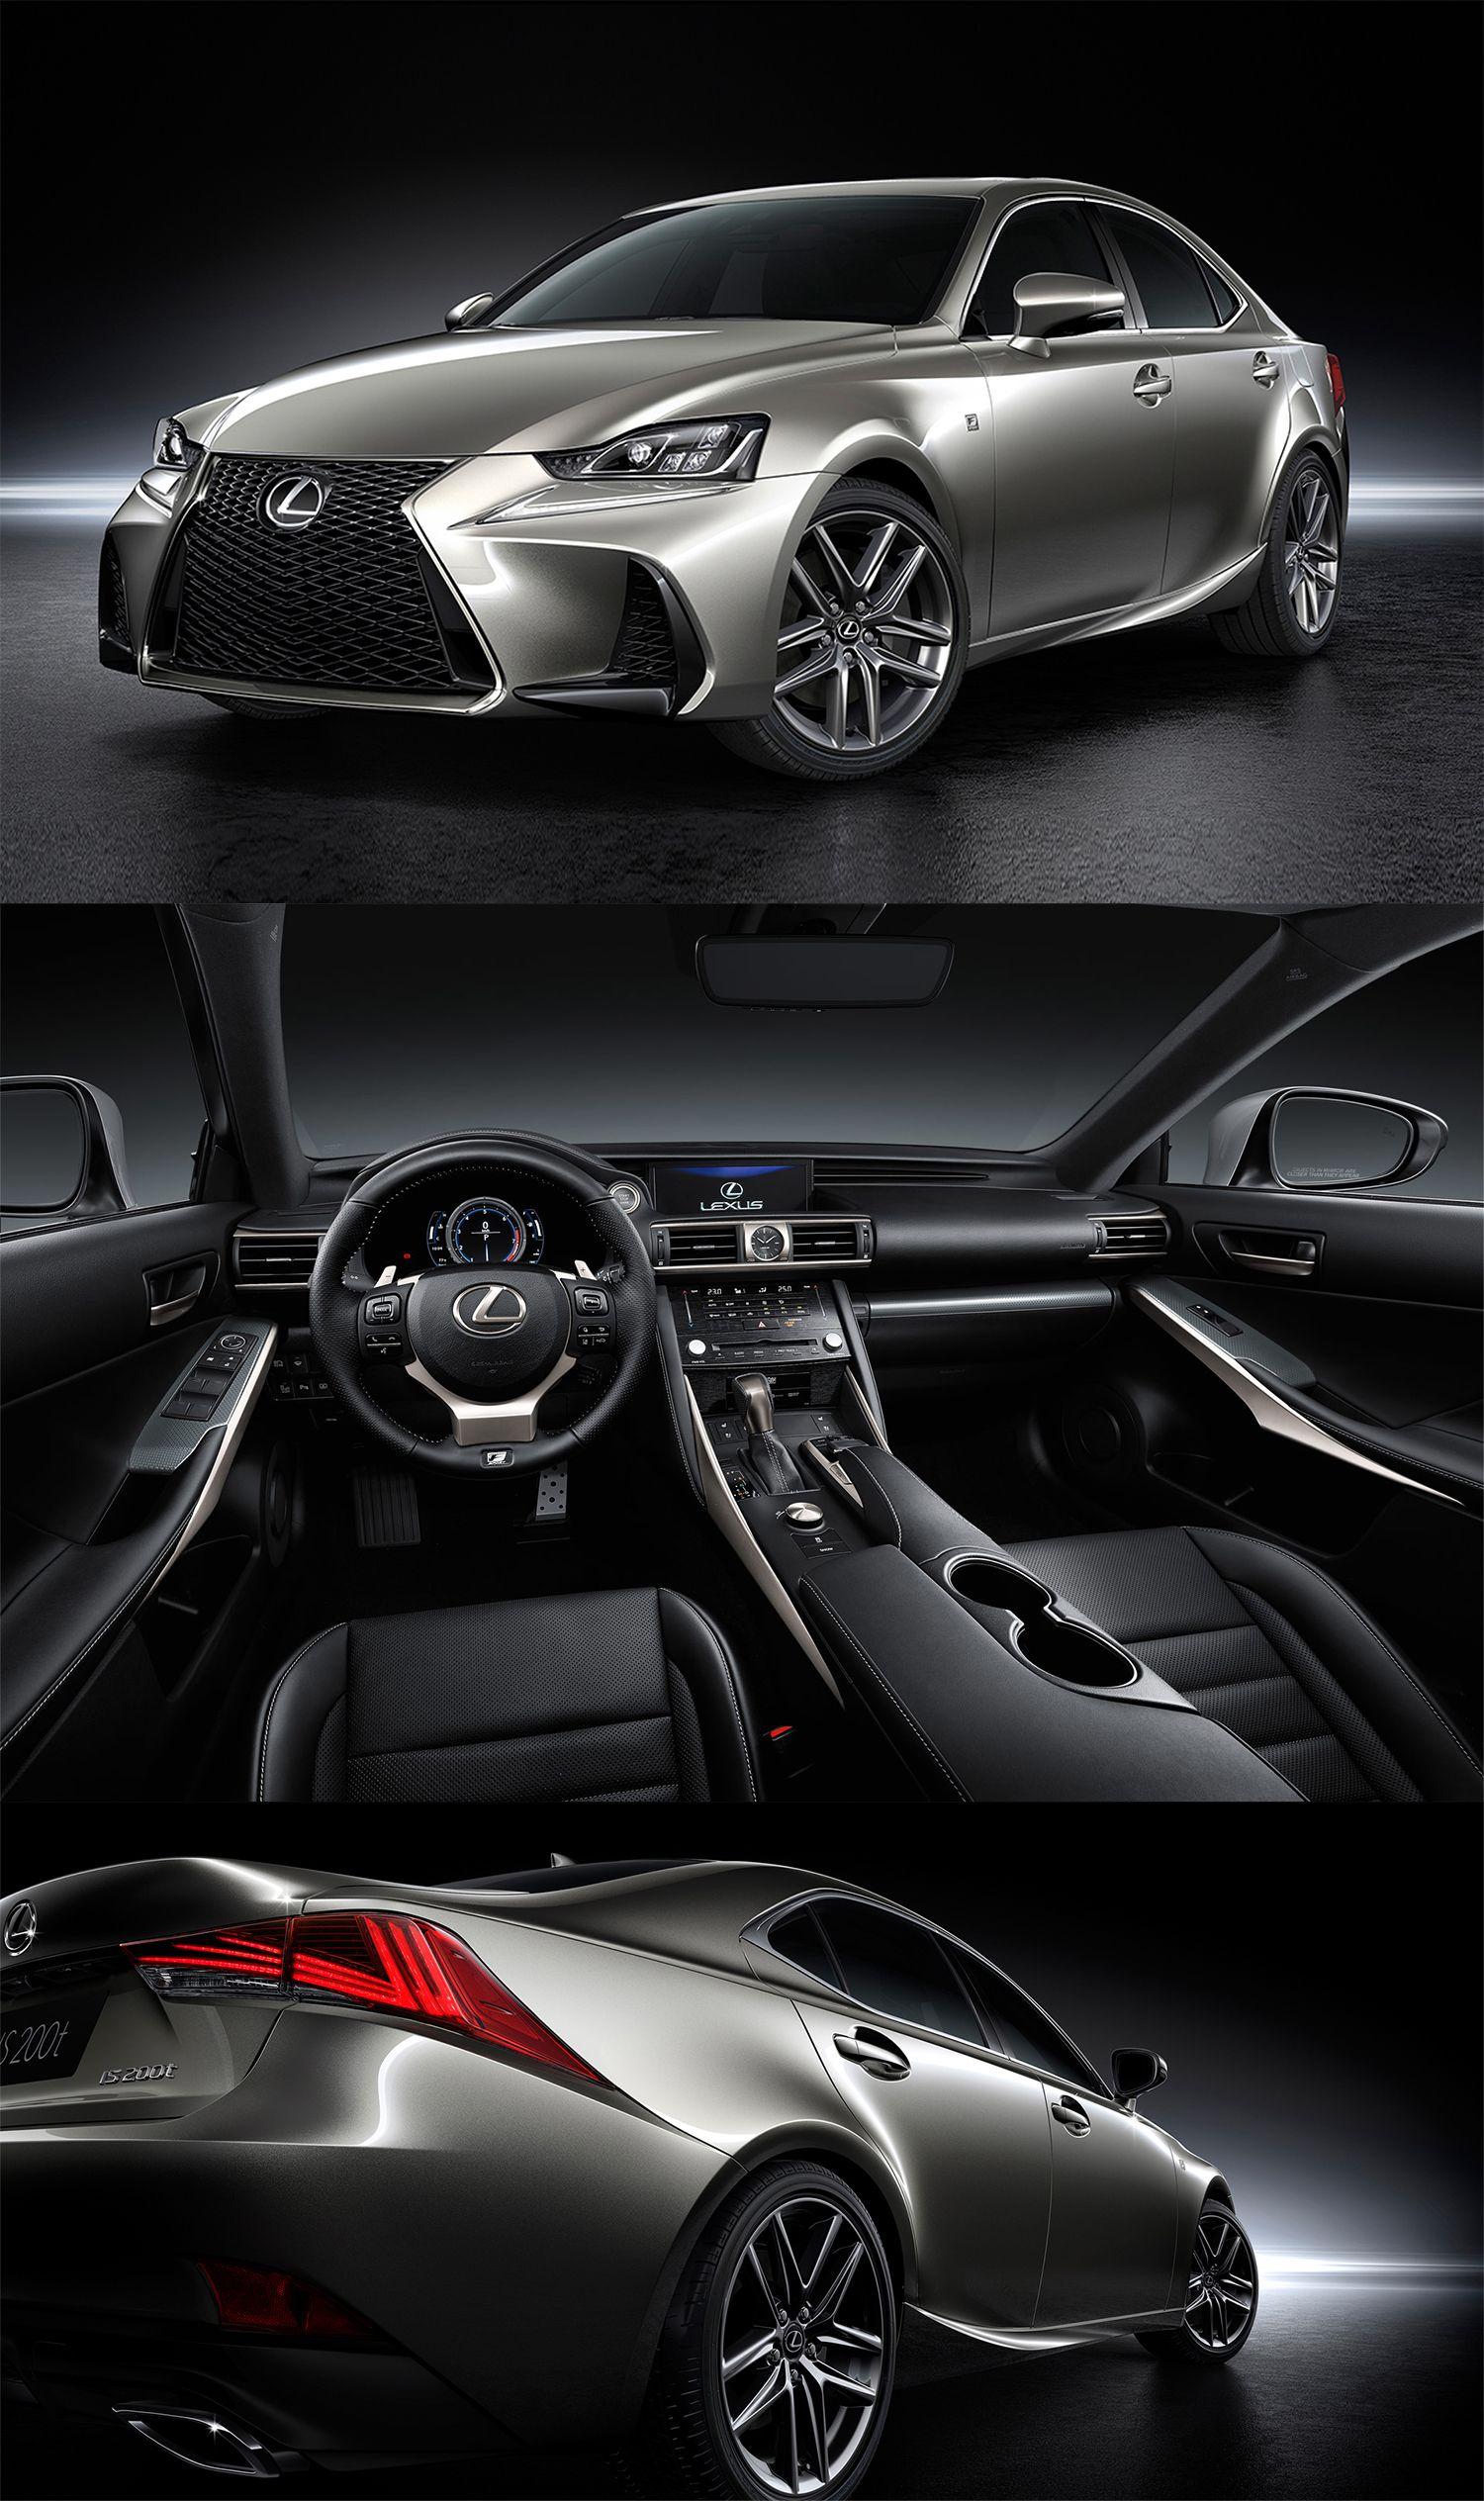 2017 Lexus IS350 F Sport 2 (With images) Lexus, Cars